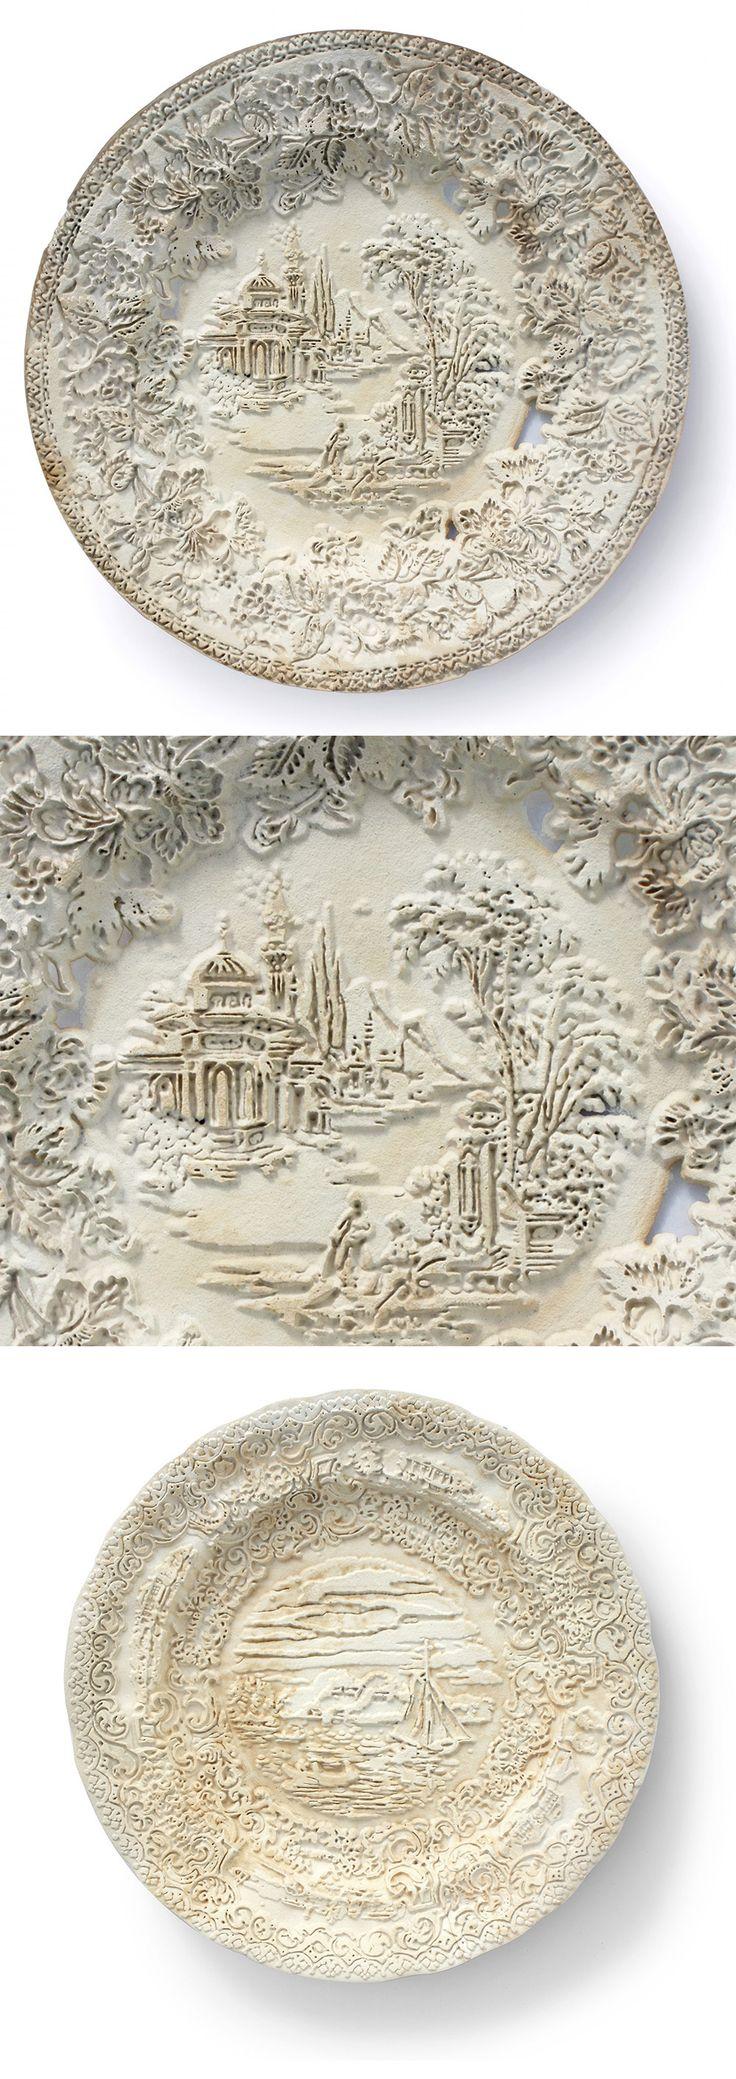 Repurposed Antique Dishware Sandblasted Into Bas-Relief Sculptures by Caroline Slotte